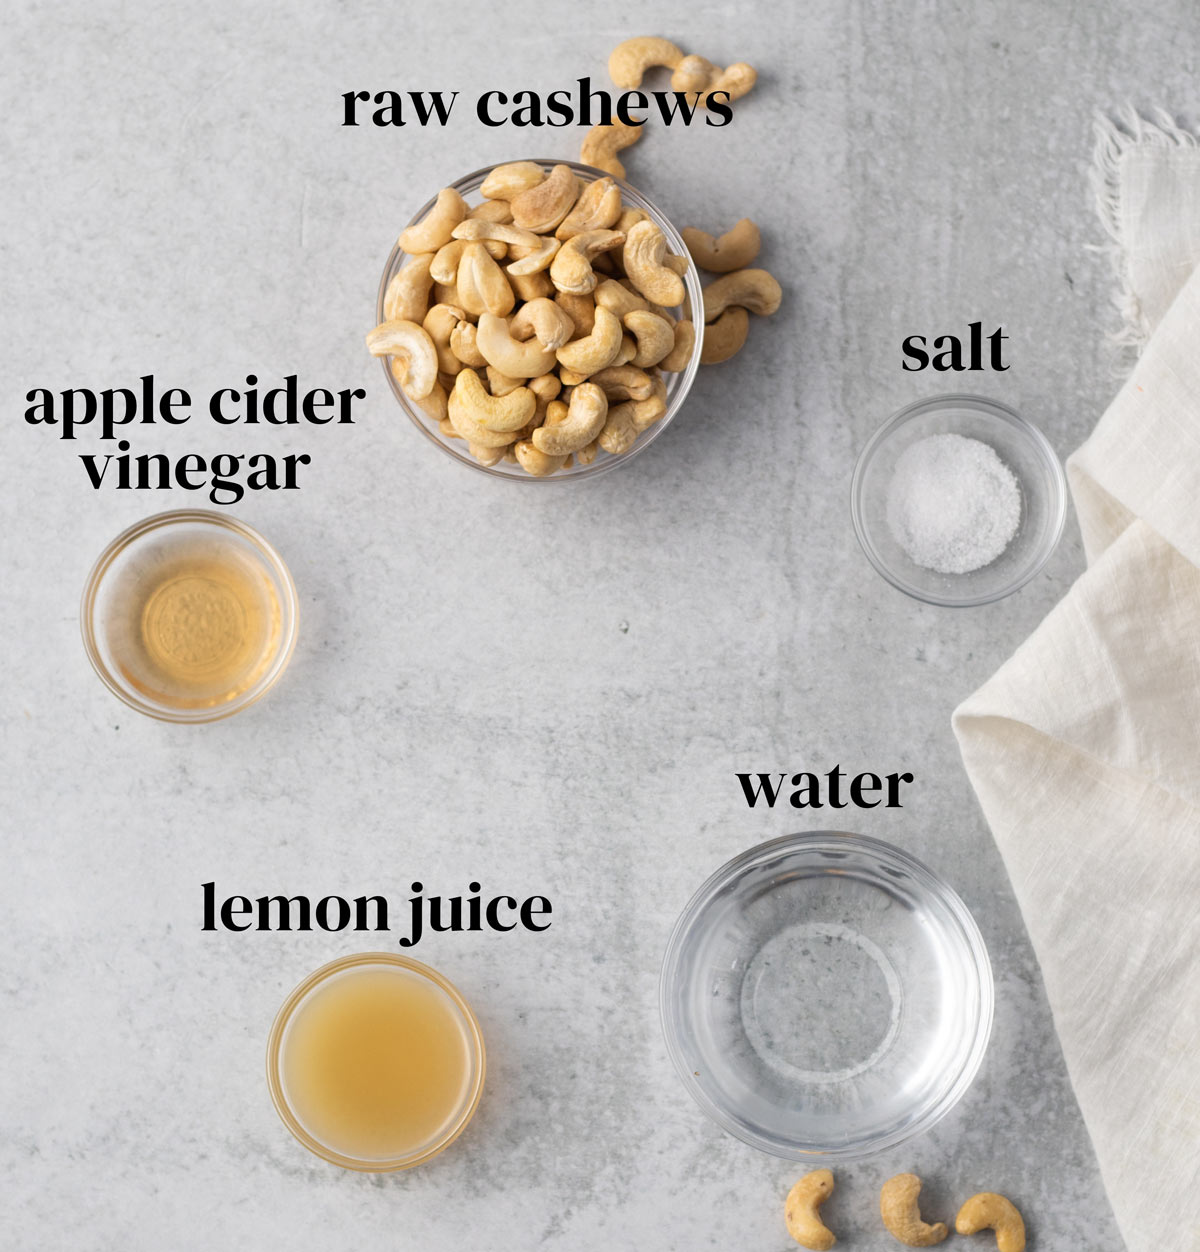 Ingredients for making vegan sour cream (cashews, apple cider vinegar, lemon juice, water, and salt.)